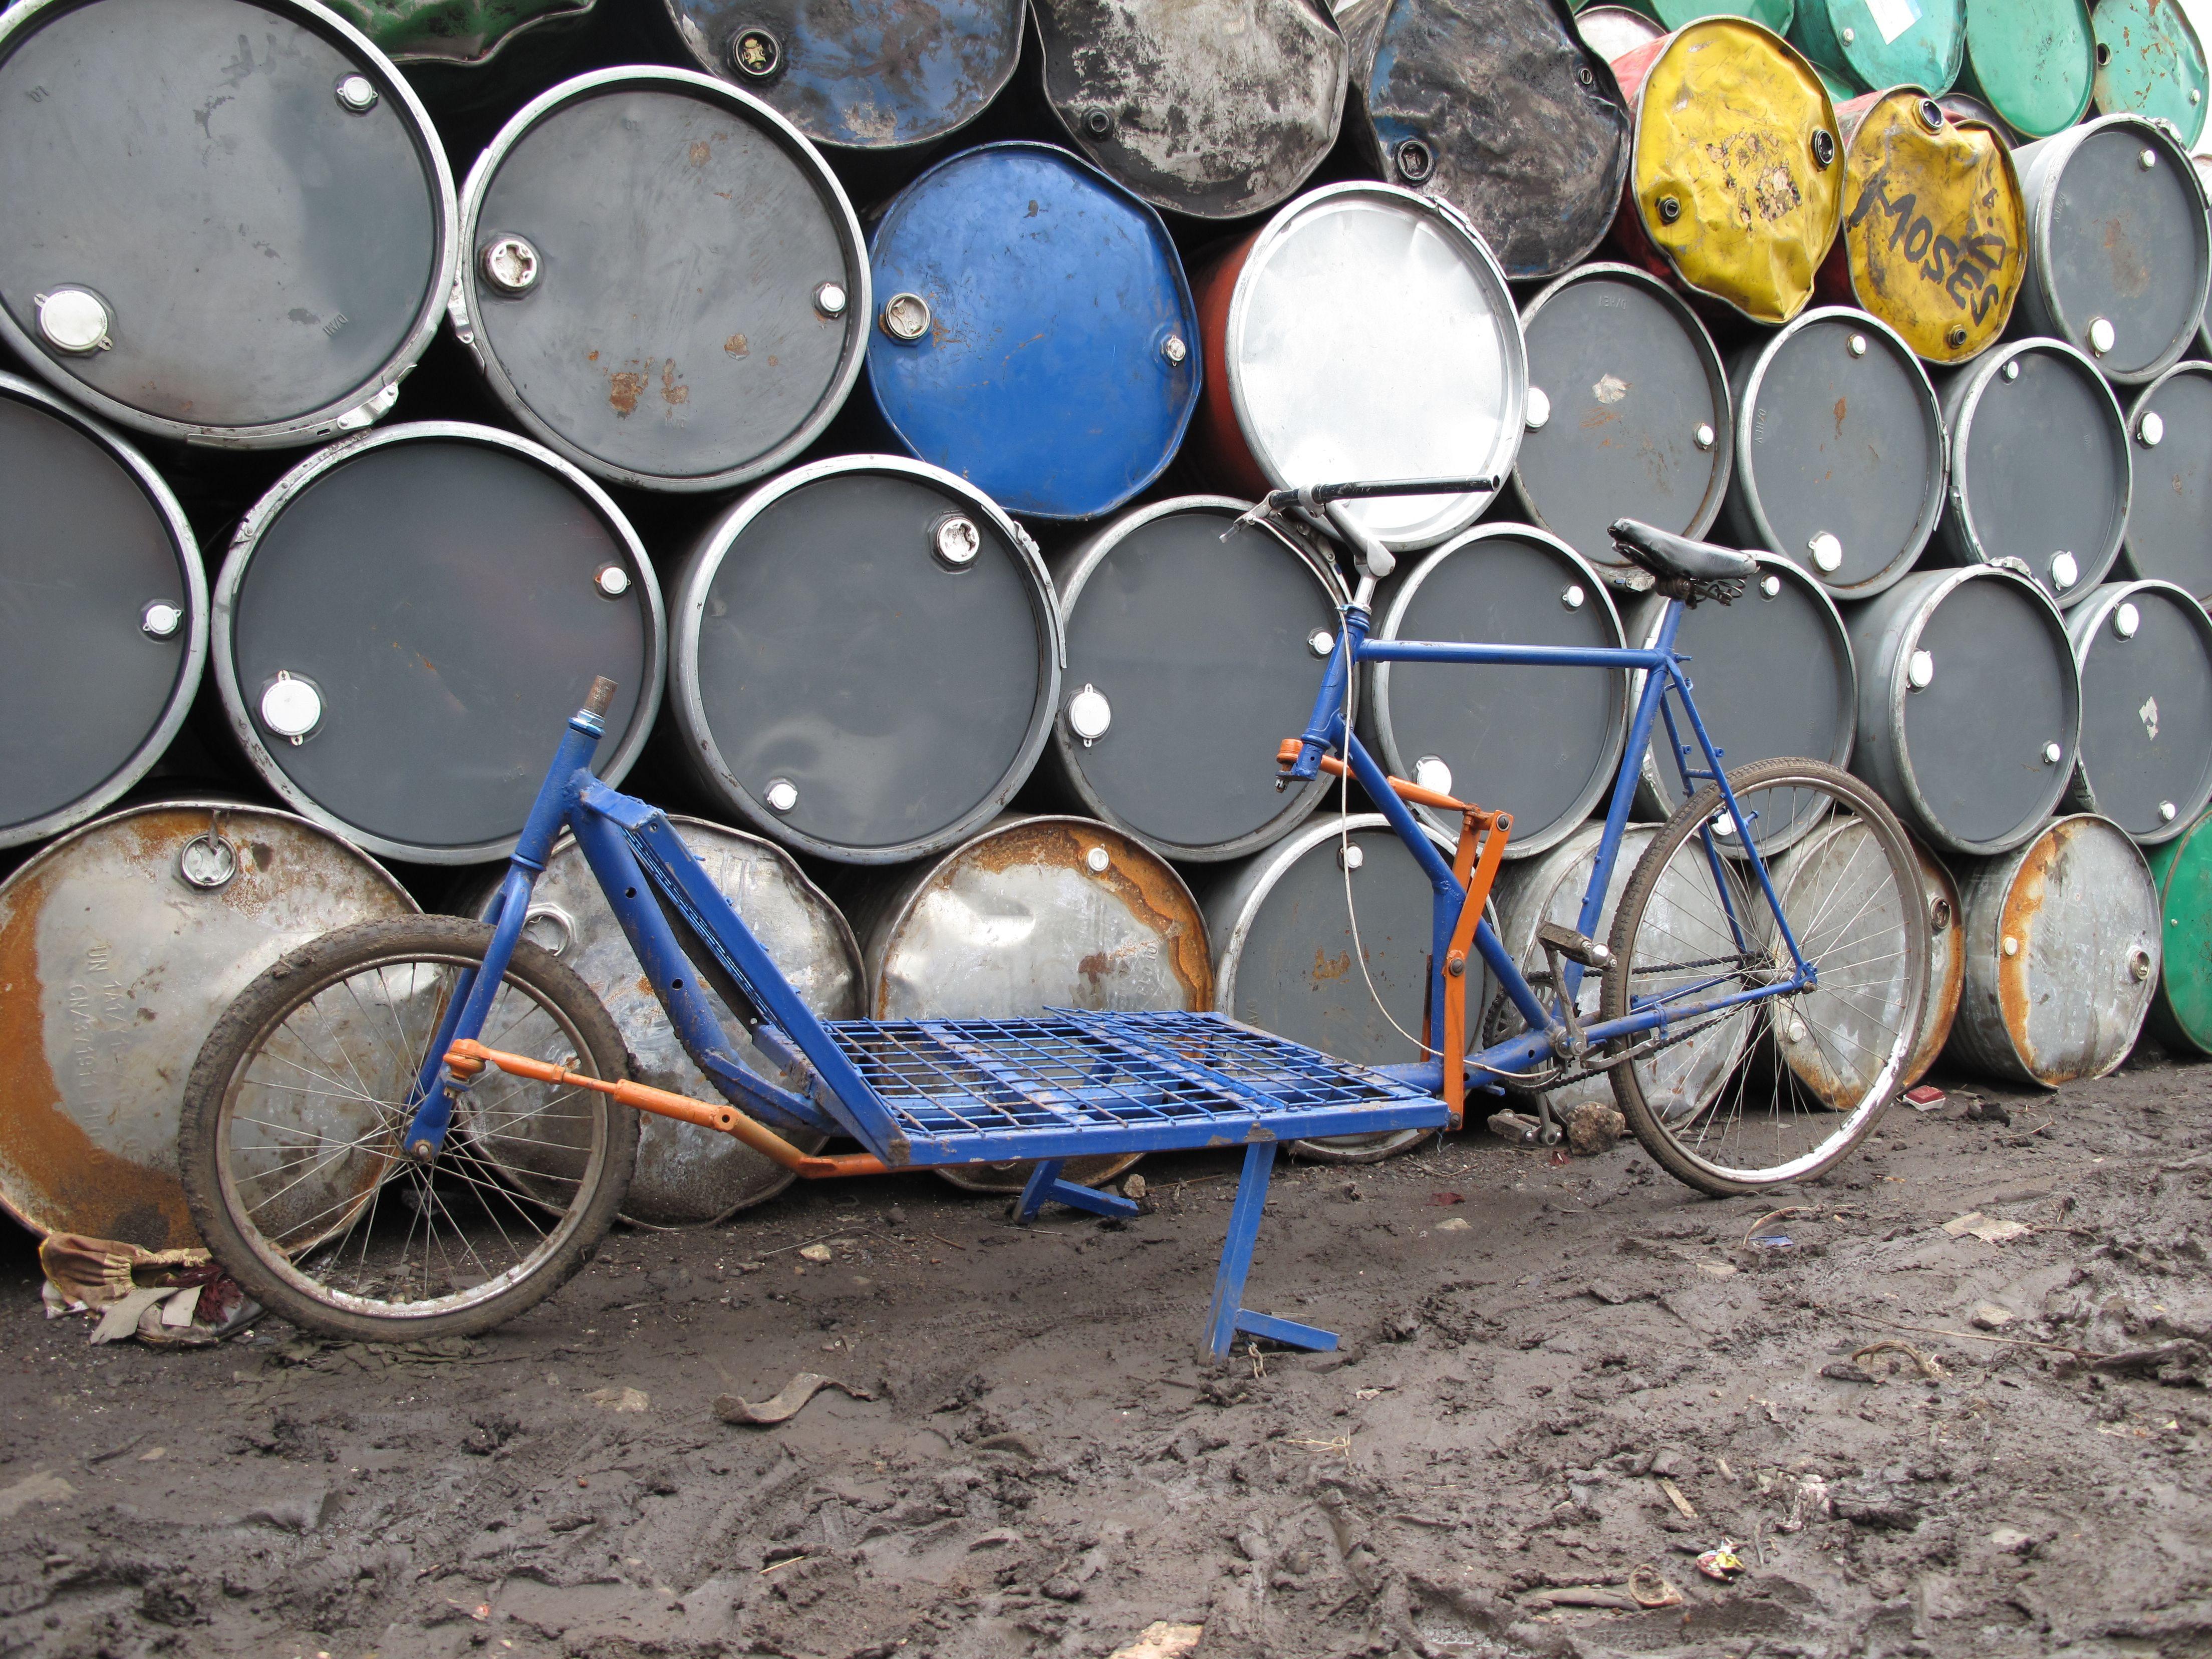 Walter Maurice Cargo Bike Built In Nairobi Kenya 2010 Cargo